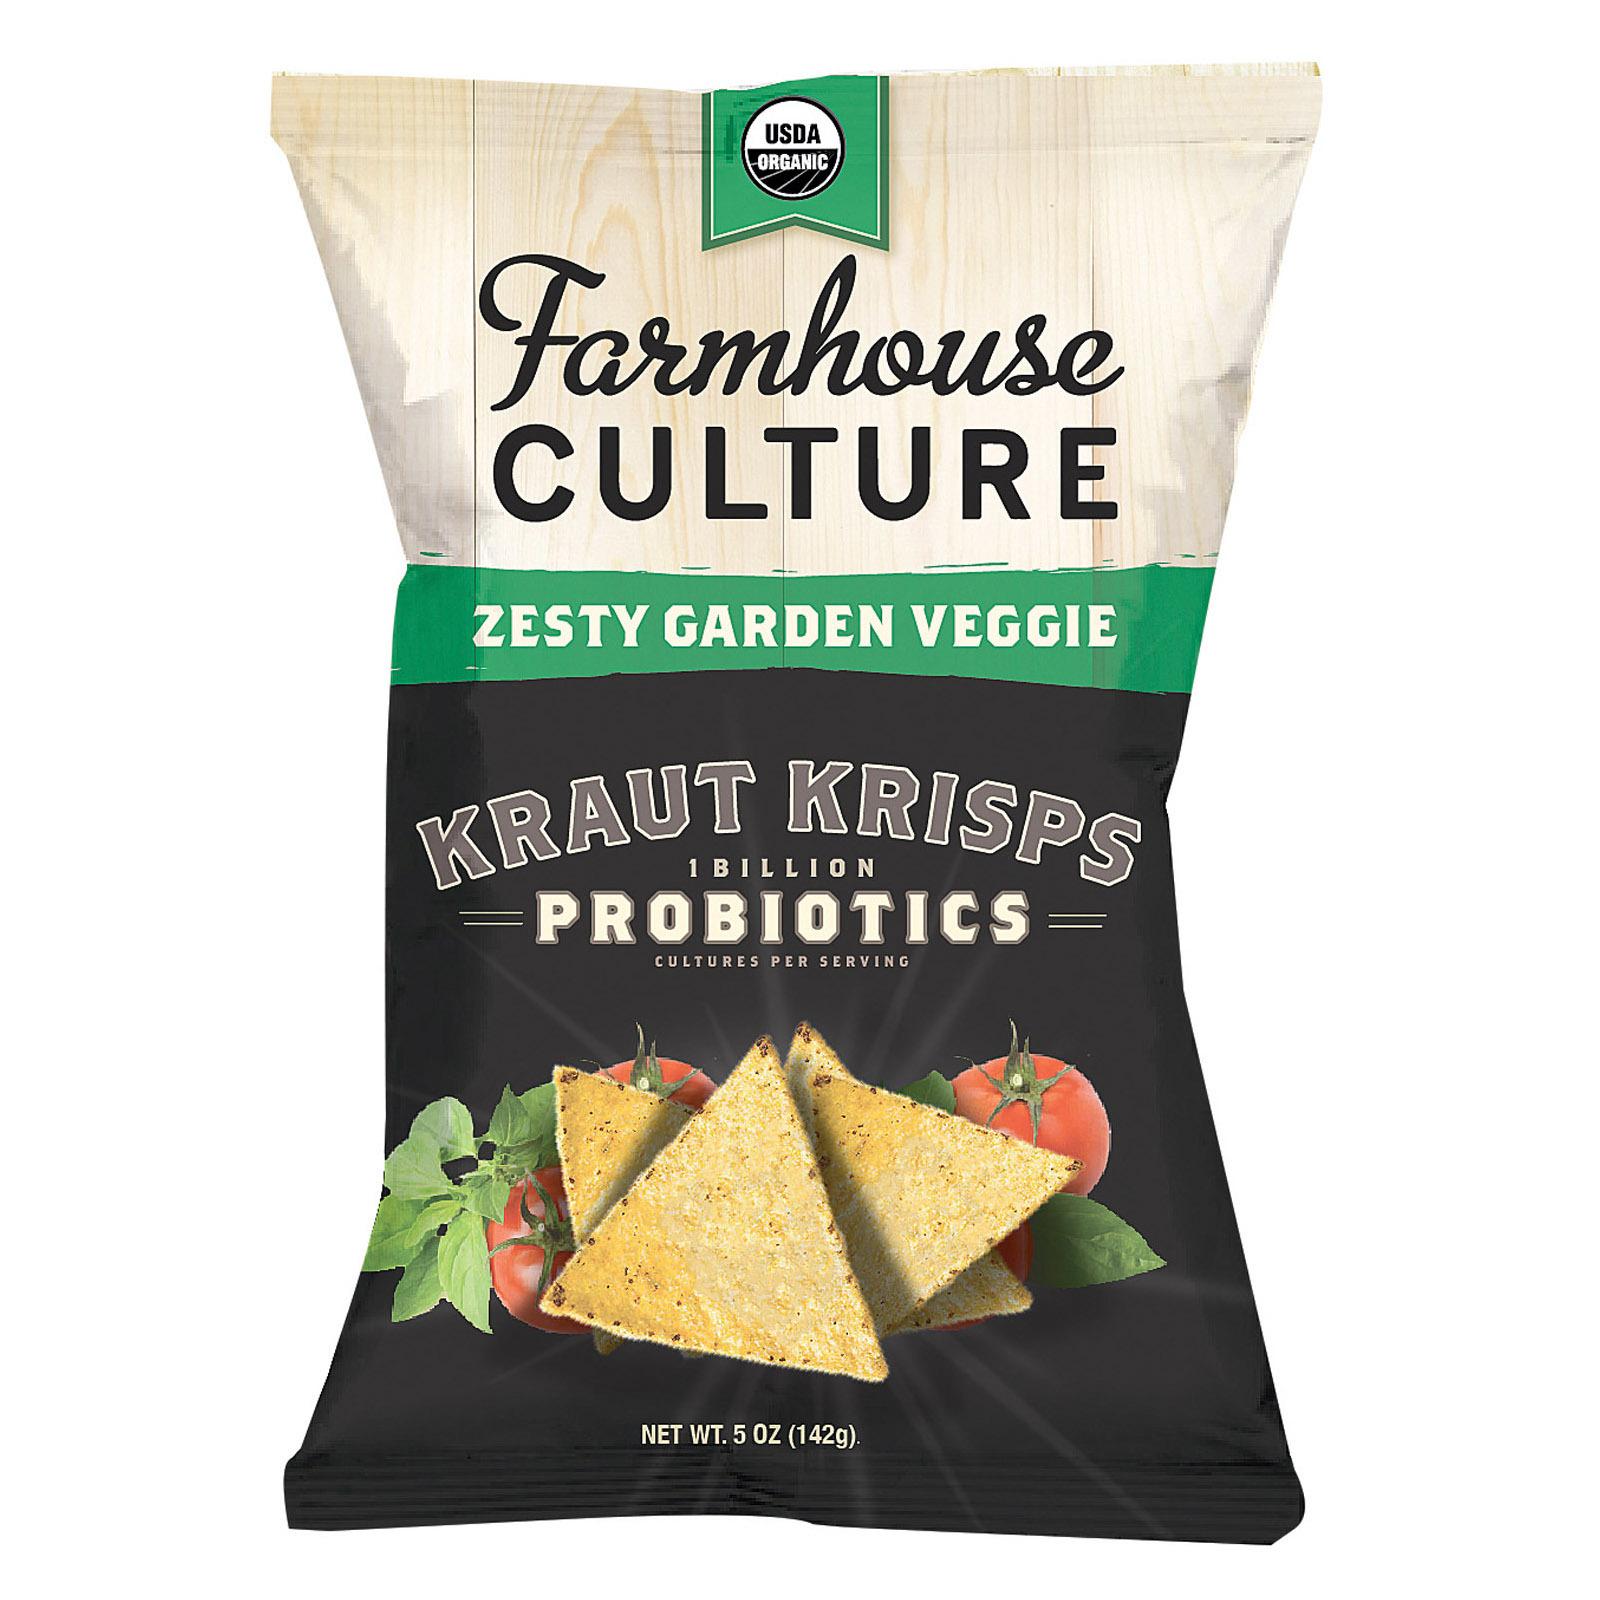 Farmhouse Culture Organic Probiotic Kraut Krisps - Zesty Garden Veggie - Case of 12 - 5 oz